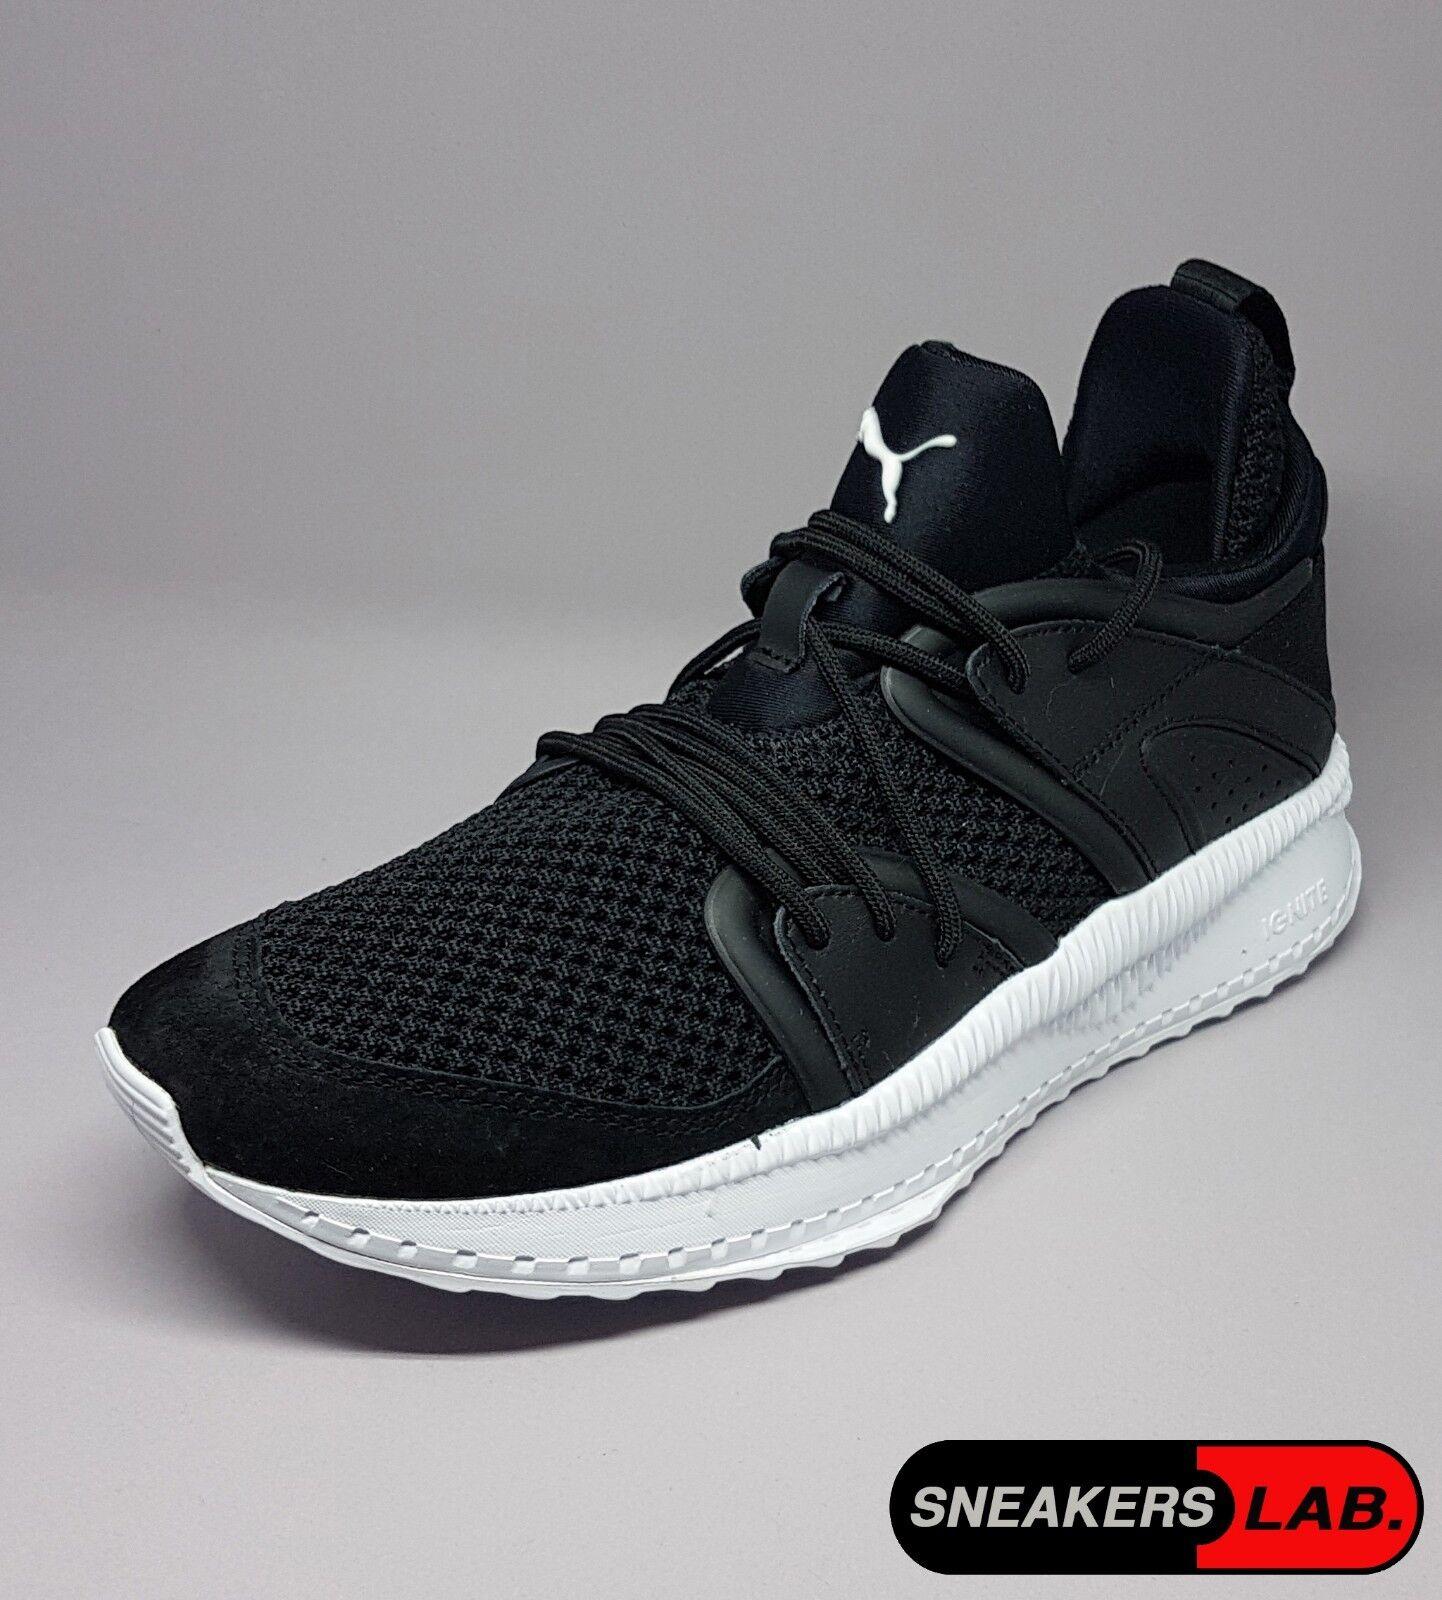 363745-01 Puma Tsugi Blaze Black White Men Sneakers Size 8US (7UK, 40.5EUR)